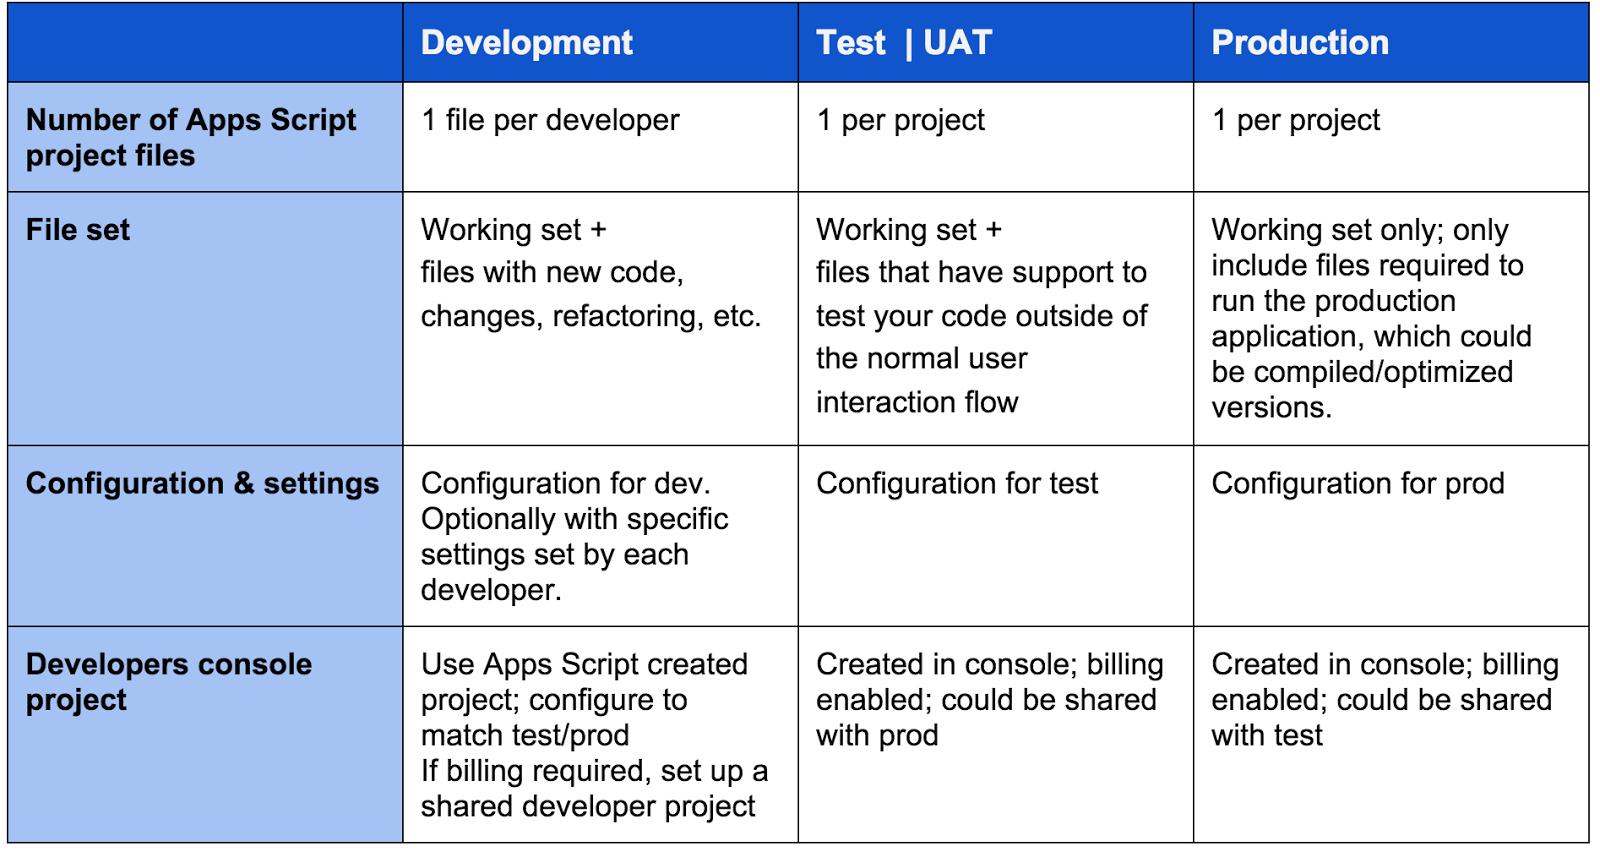 Google Developers Blog: Advanced Development Process with